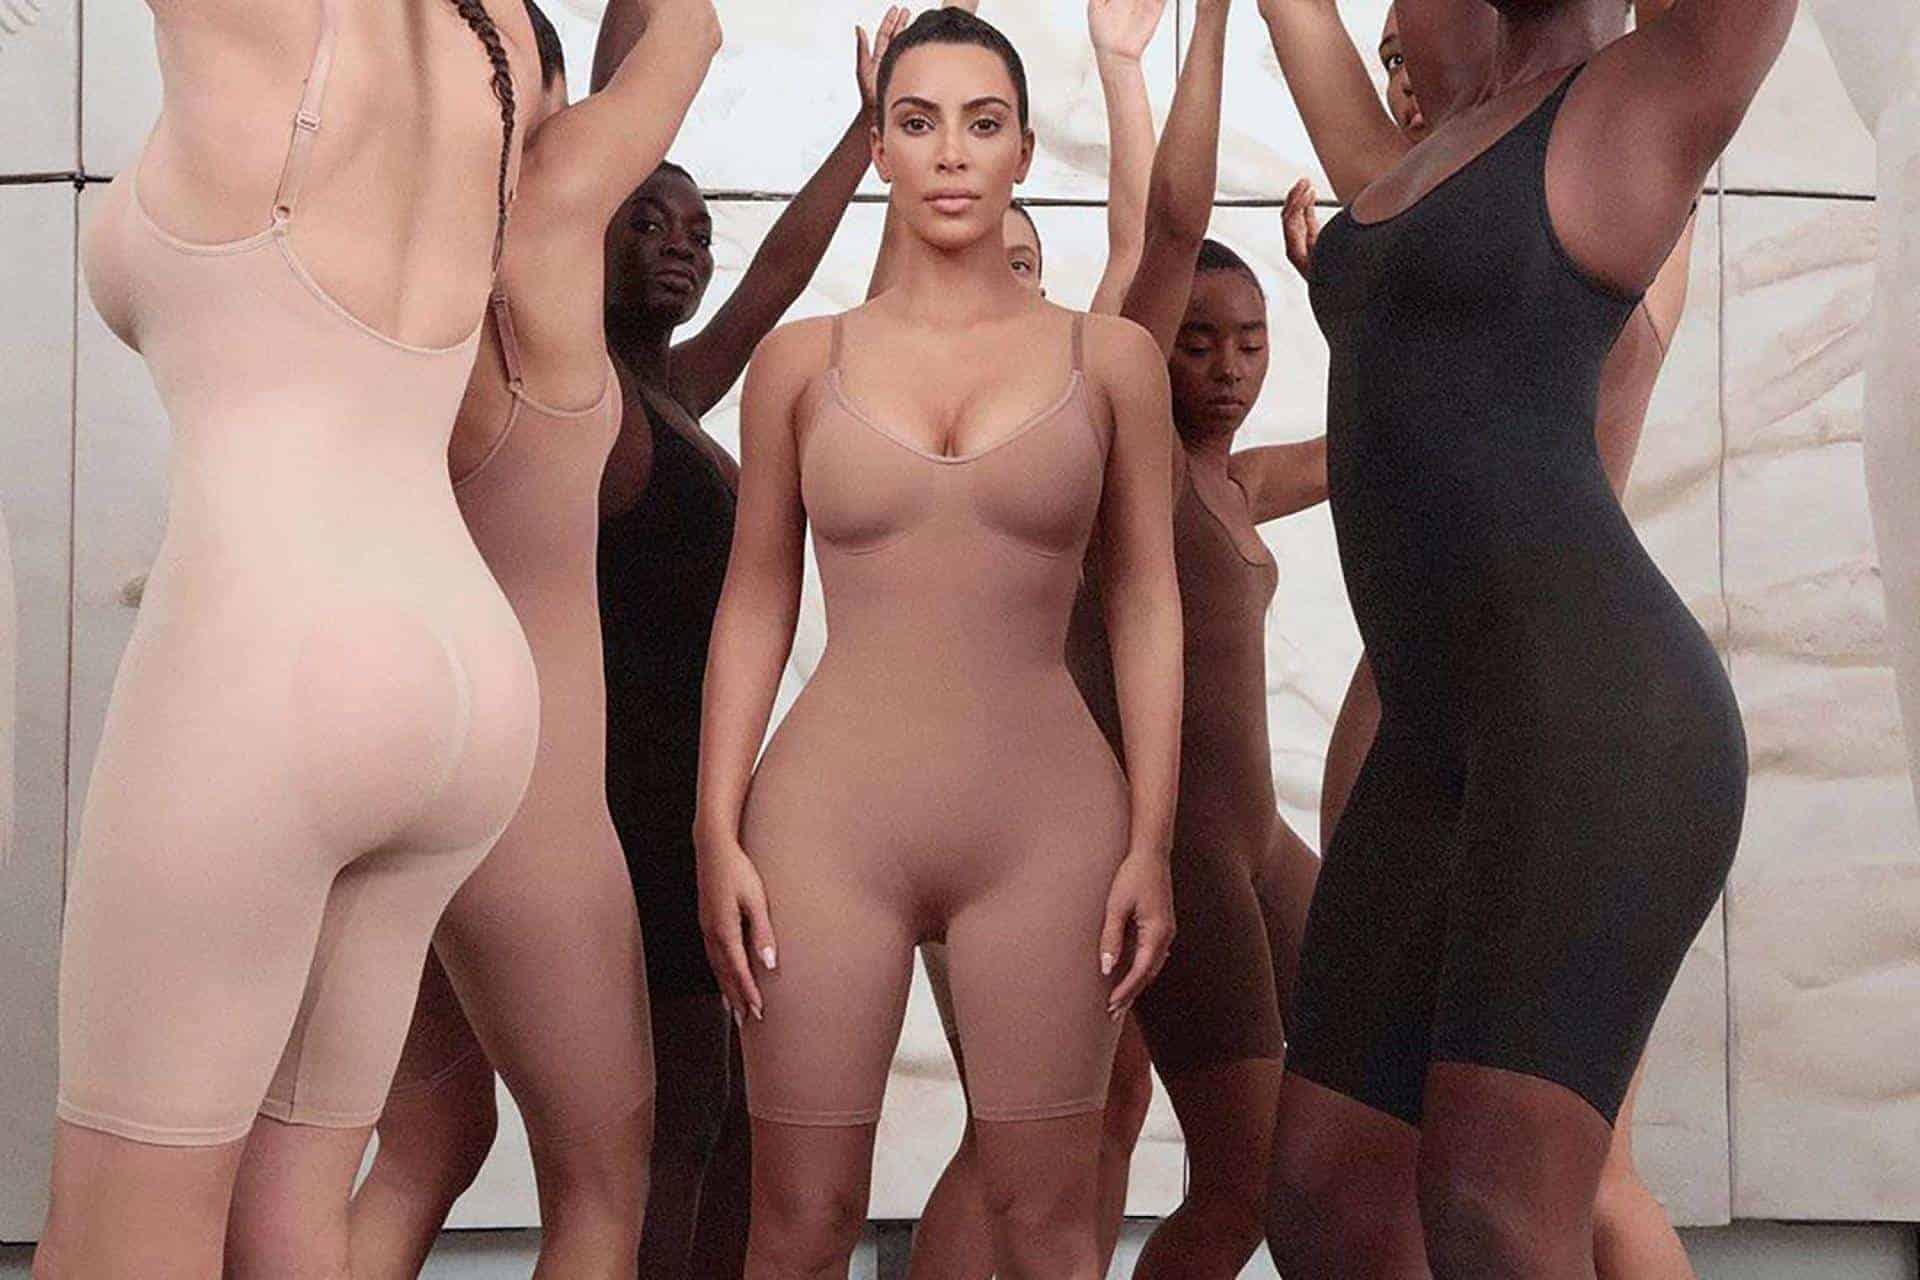 A look at Kim Kardashian's Kimono shapewear brand (now Skims)